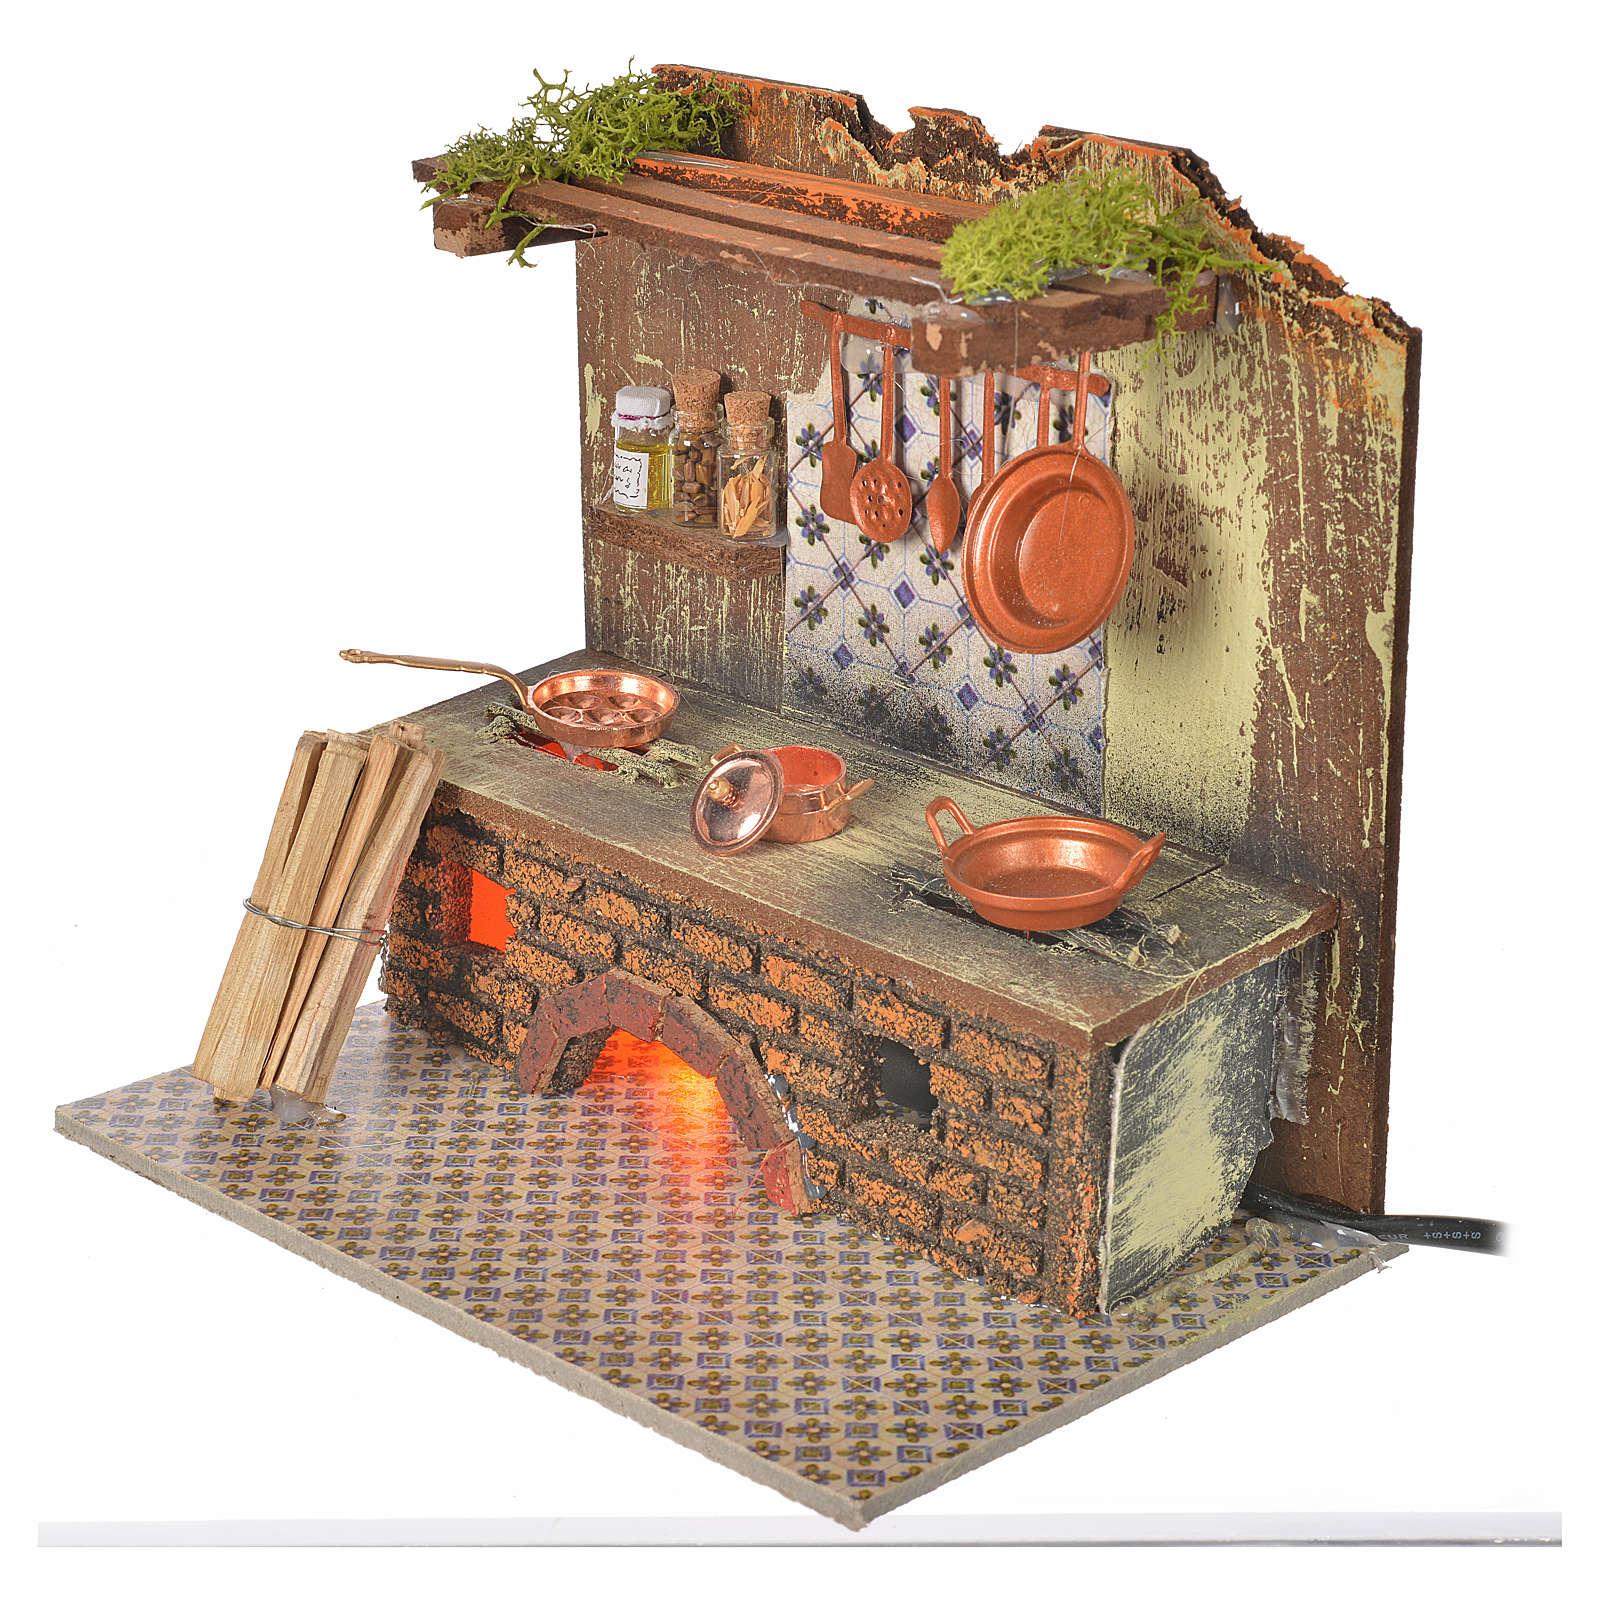 Cuisine en miniature avec effet flamme 20x14cm casseroles 4